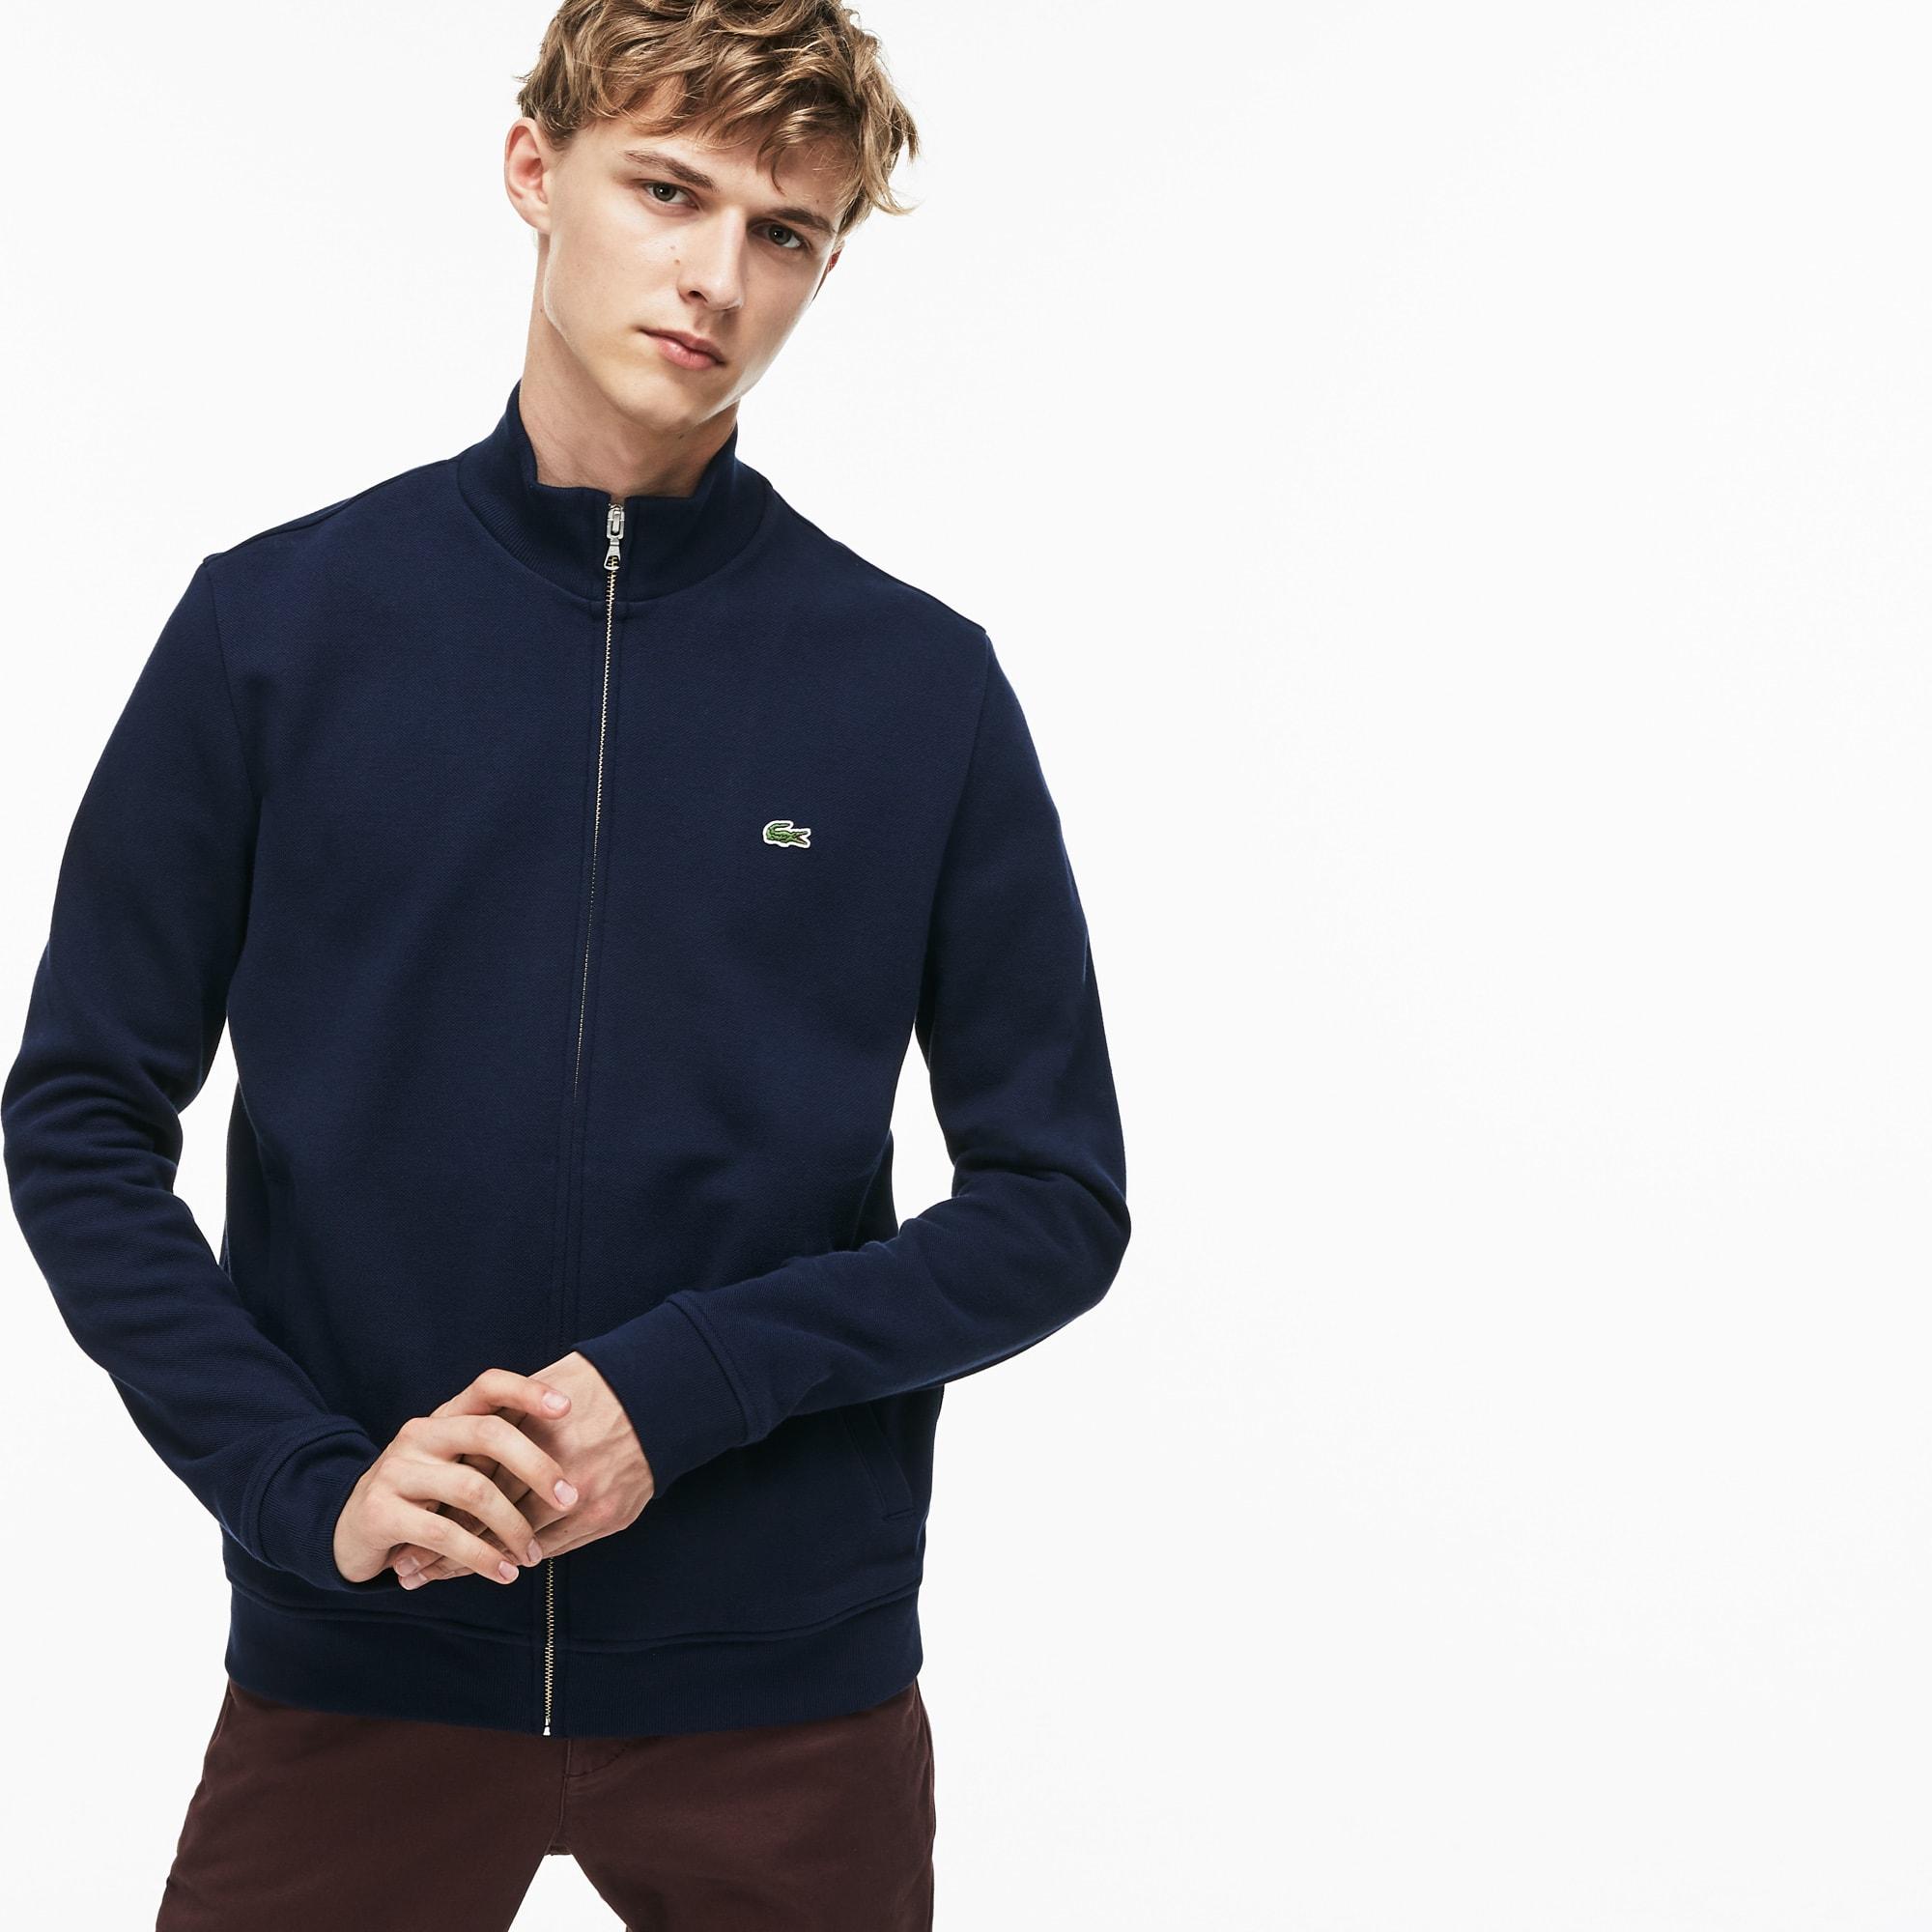 Sweatshirt zippé col montant en molleton uni